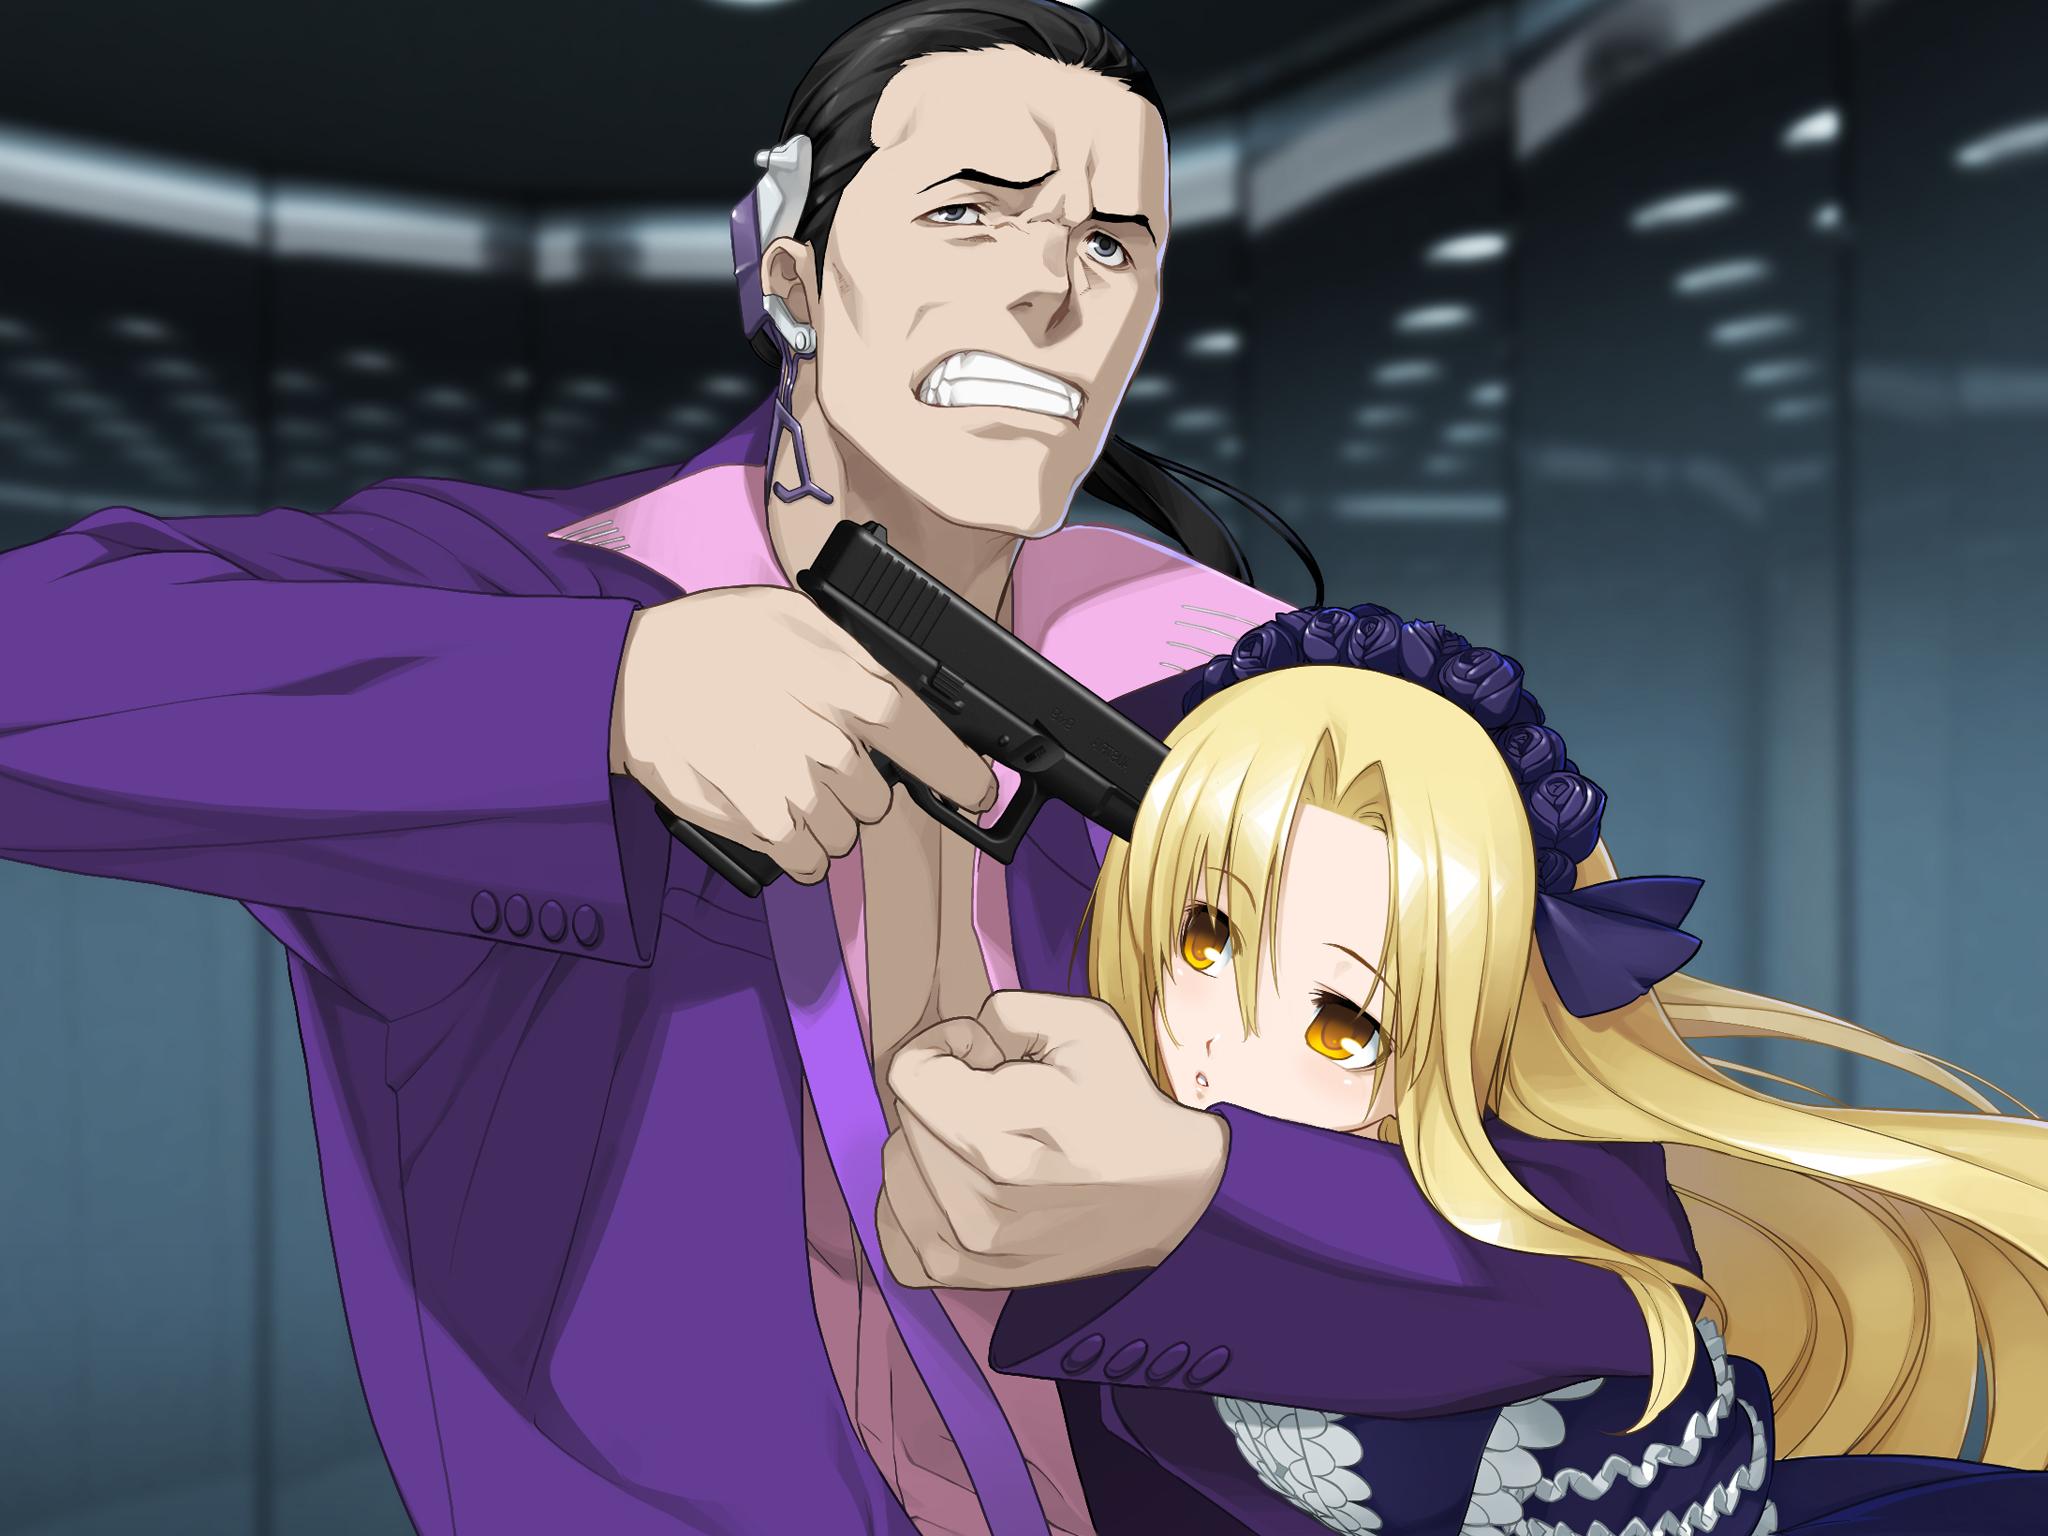 kikokugai the cyber slayer english download